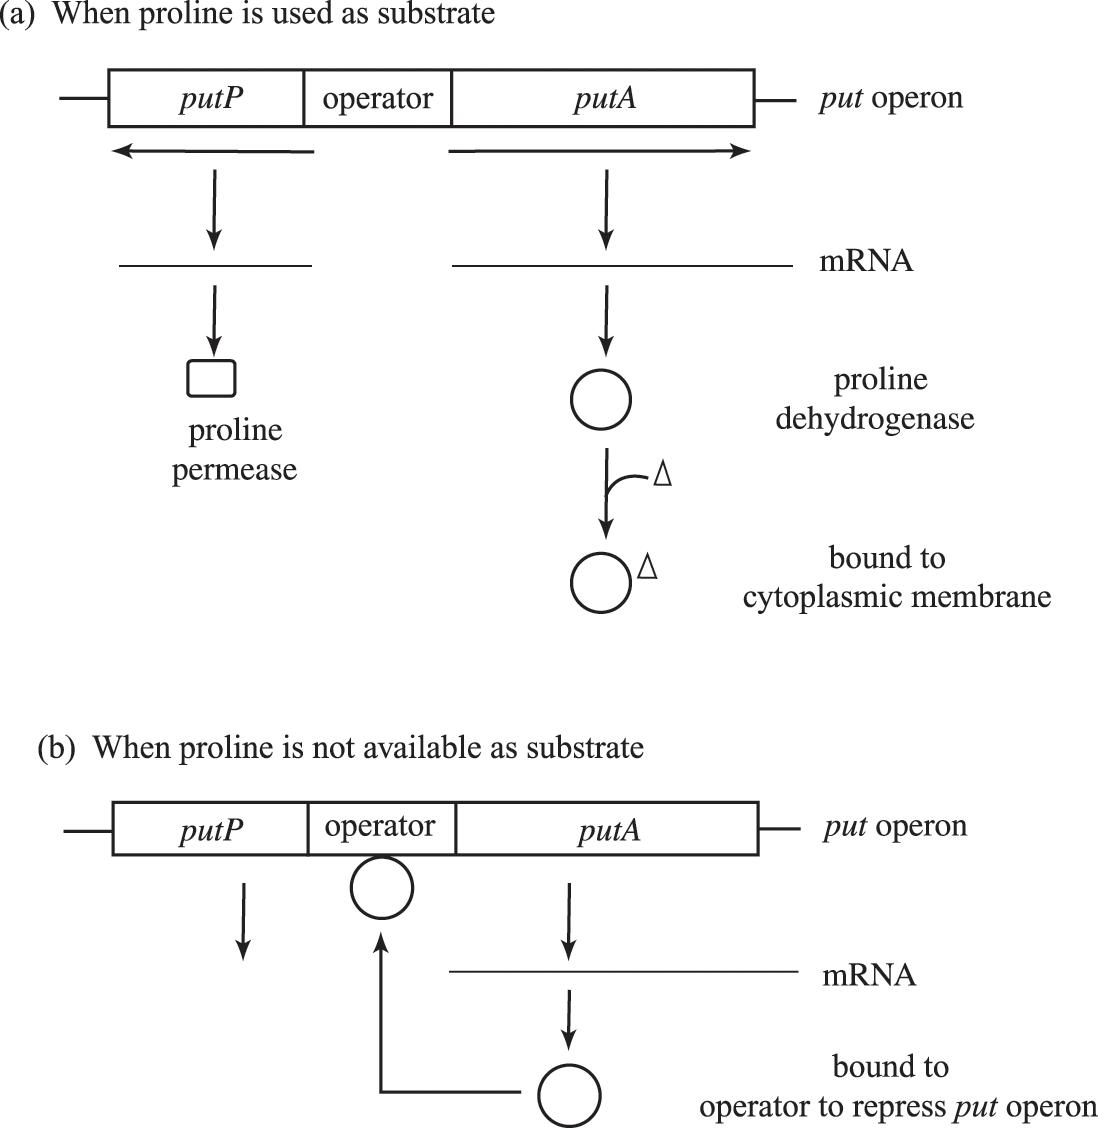 Metabolic regulation (Chapter 12) - Prokaryotic Metabolism